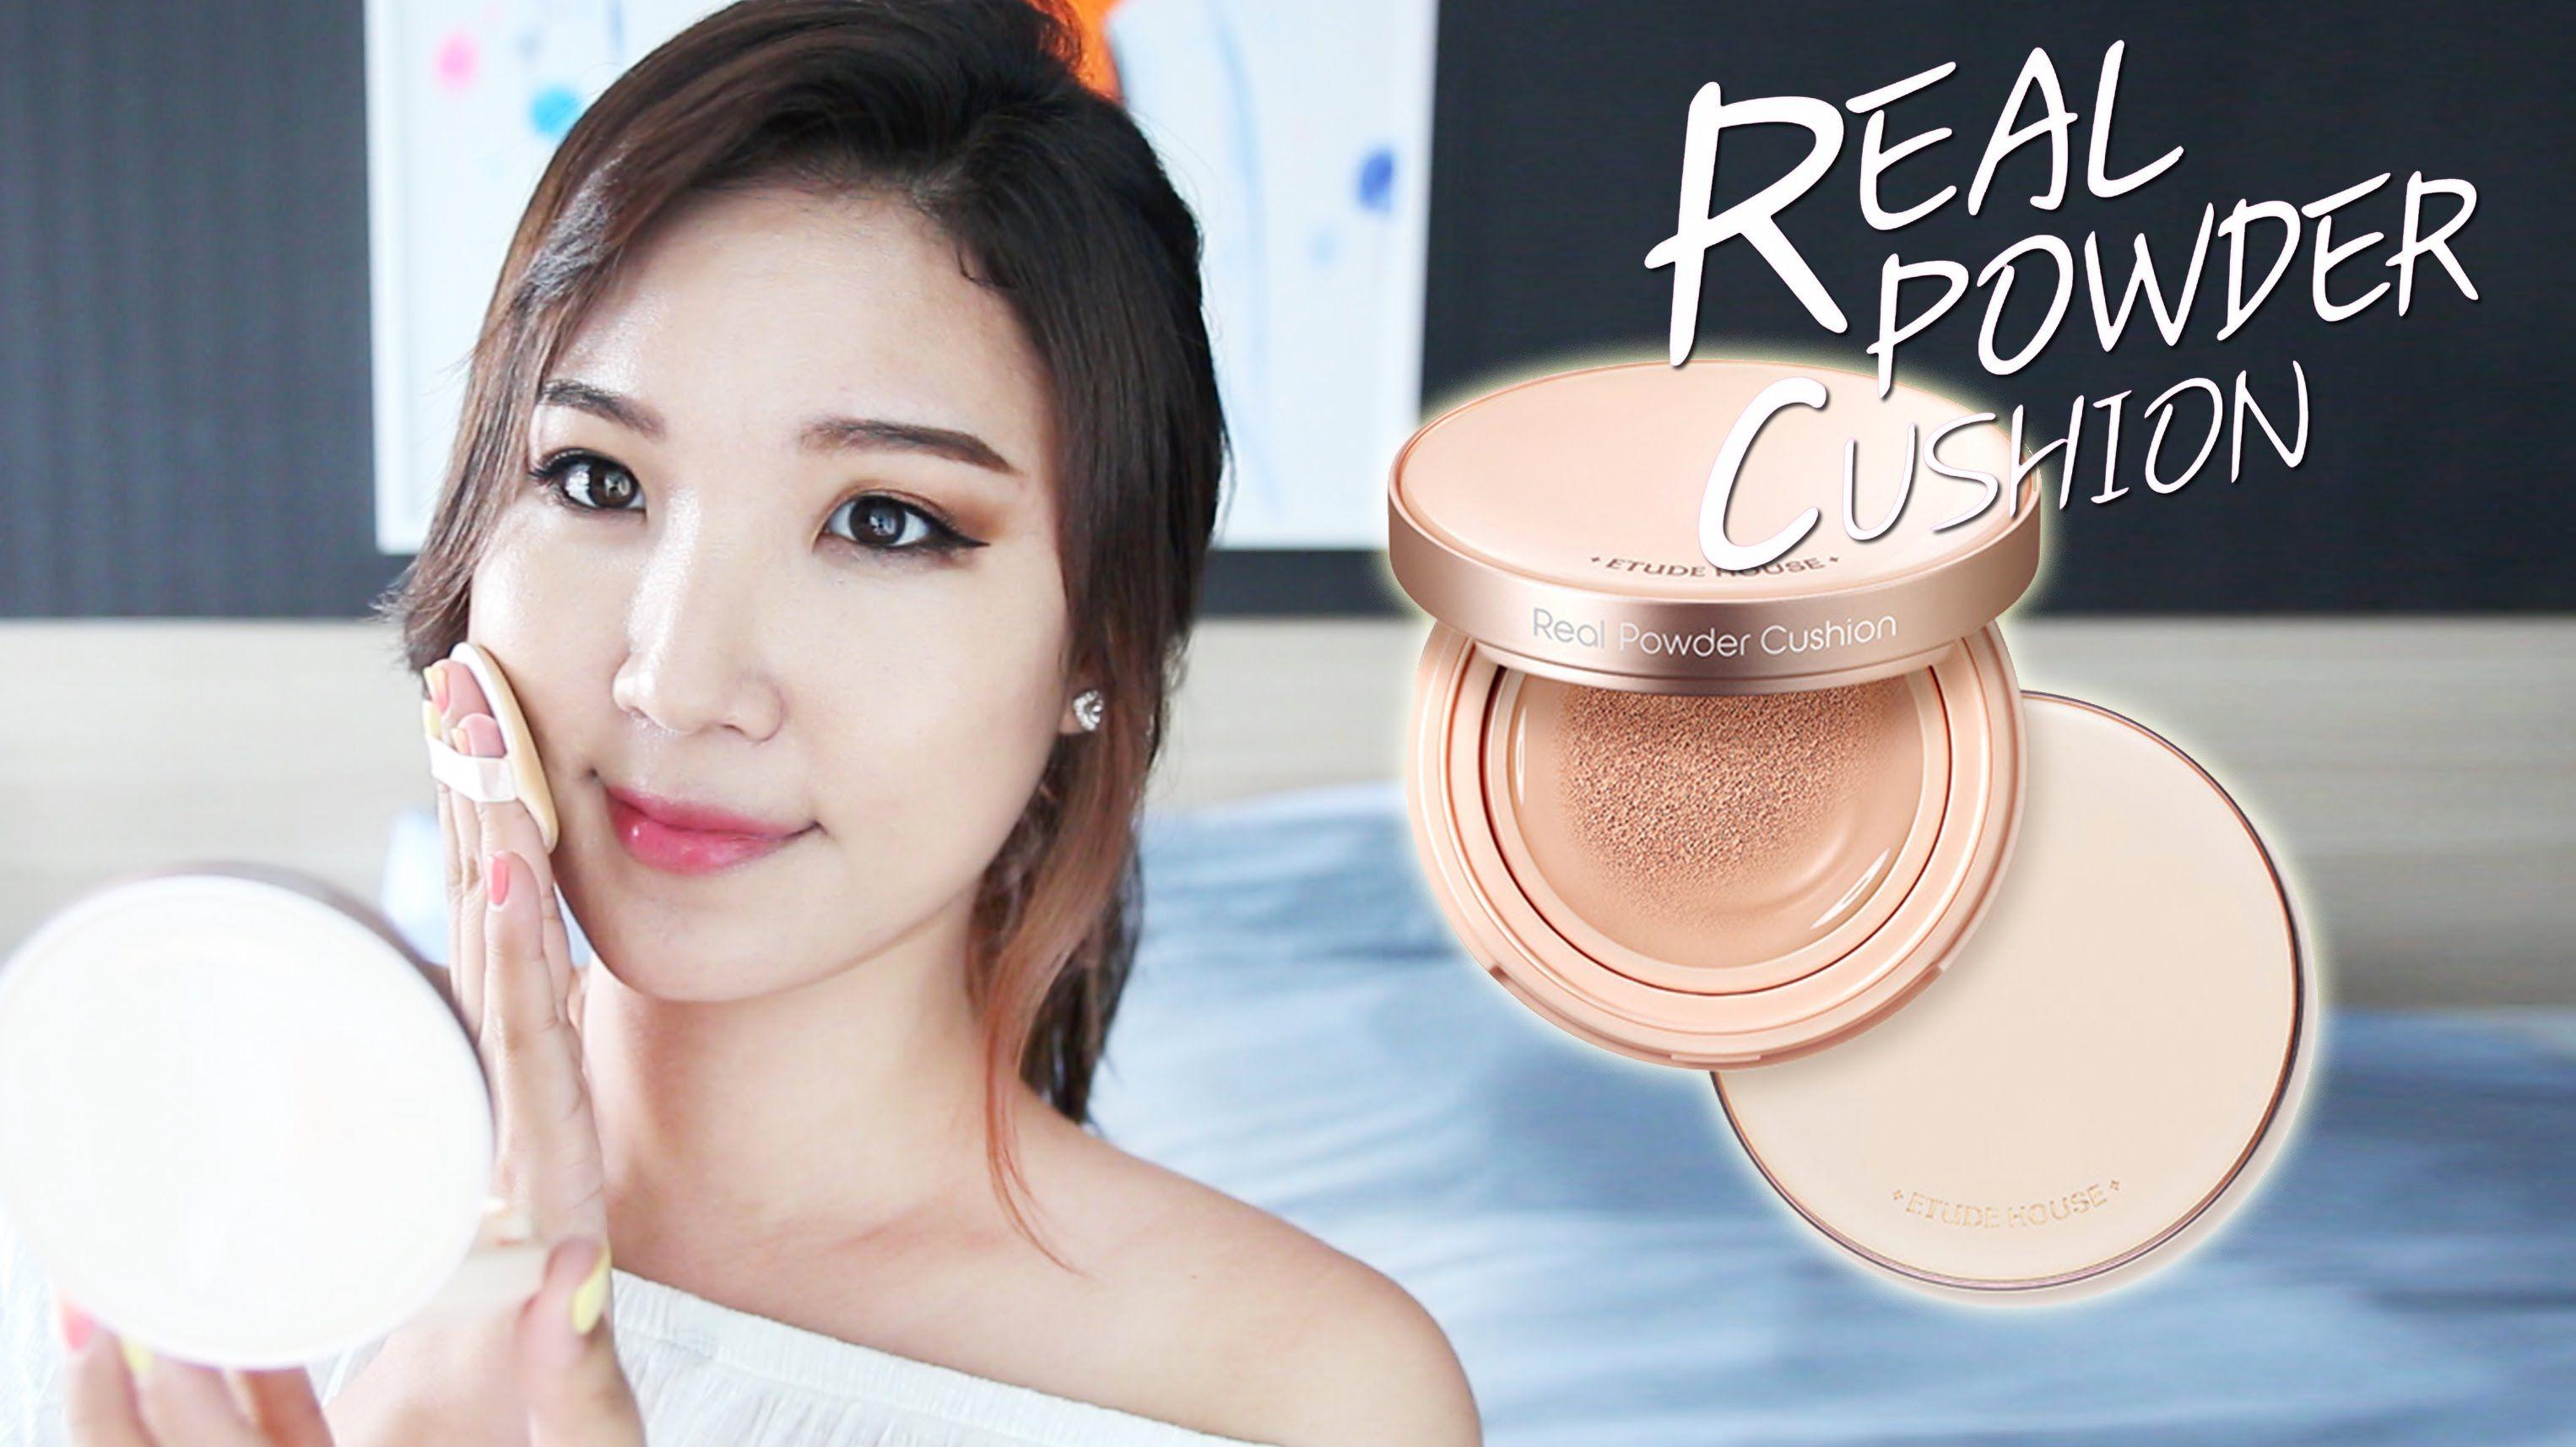 NEW! Etude House Real Powder Cushion Review Liah Yoo